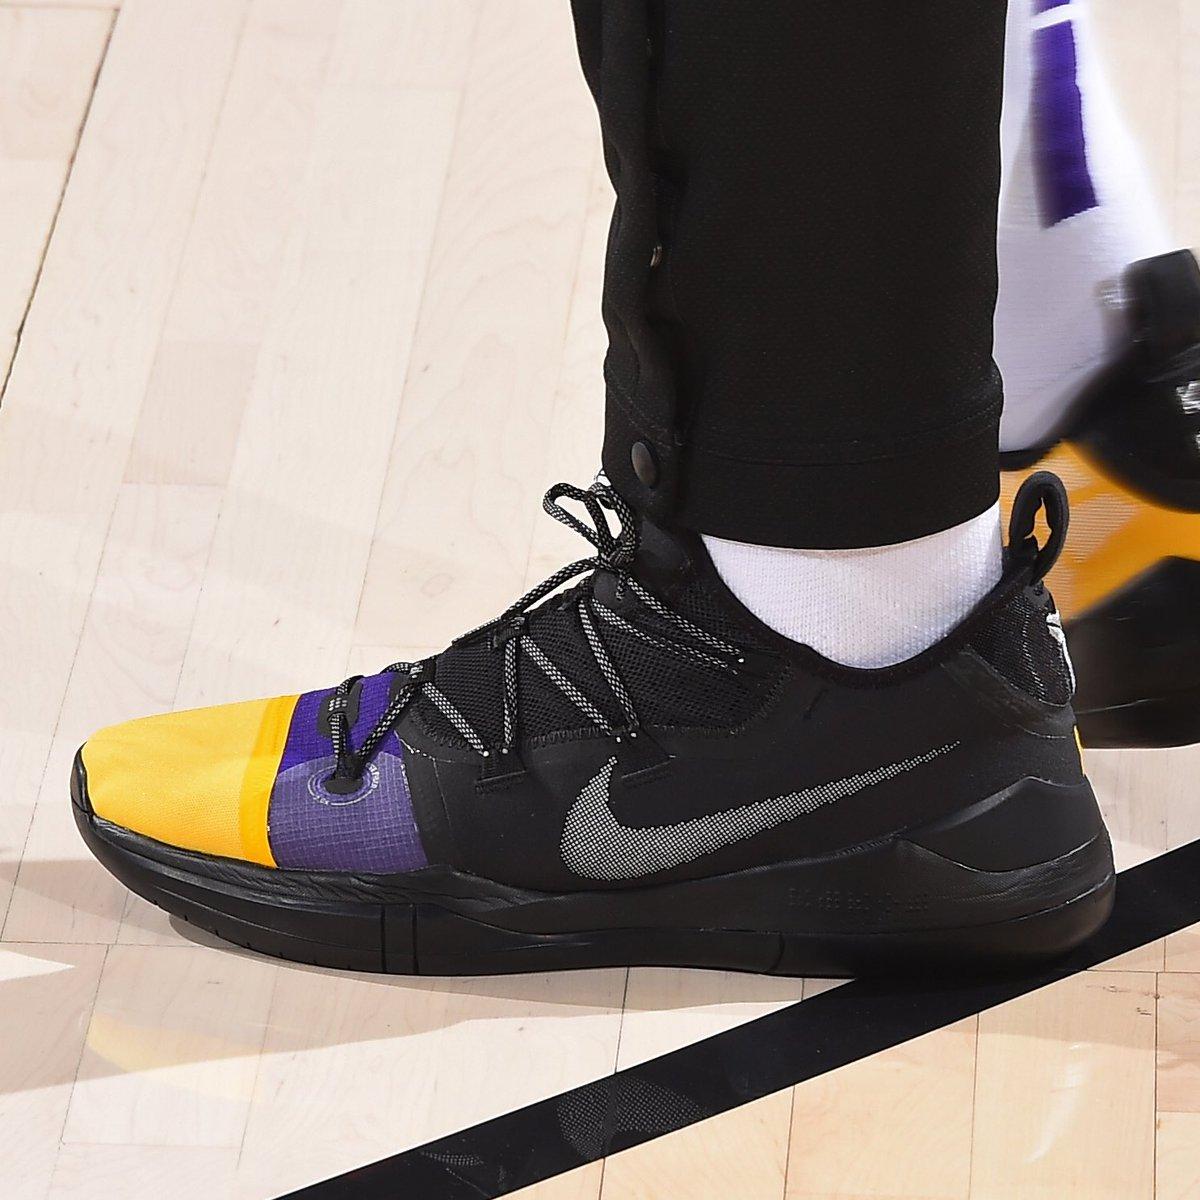 #SoleWatch: @kylekuzma rocking his Nike Kobe A.D. iD. 📸: @adbphotoinc